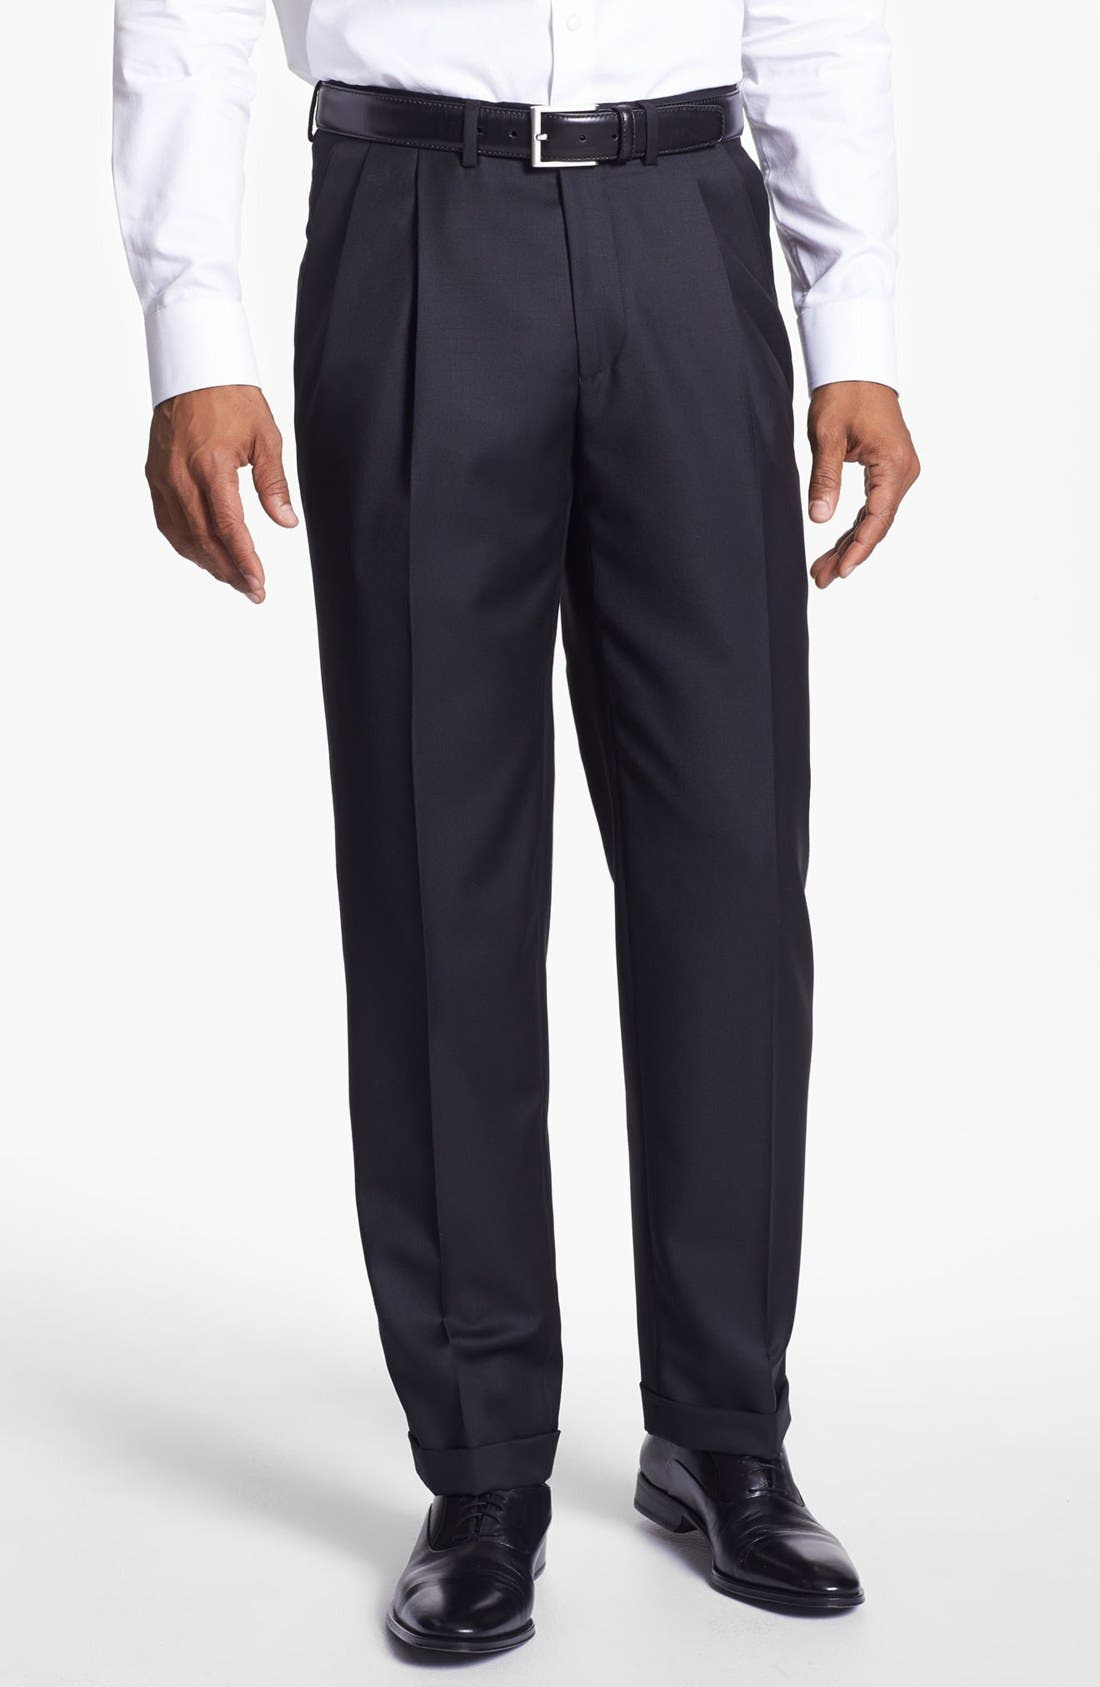 Alternate Image 1 Selected - Santorelli 'Luxury Serge' Double Pleated Wool Trousers